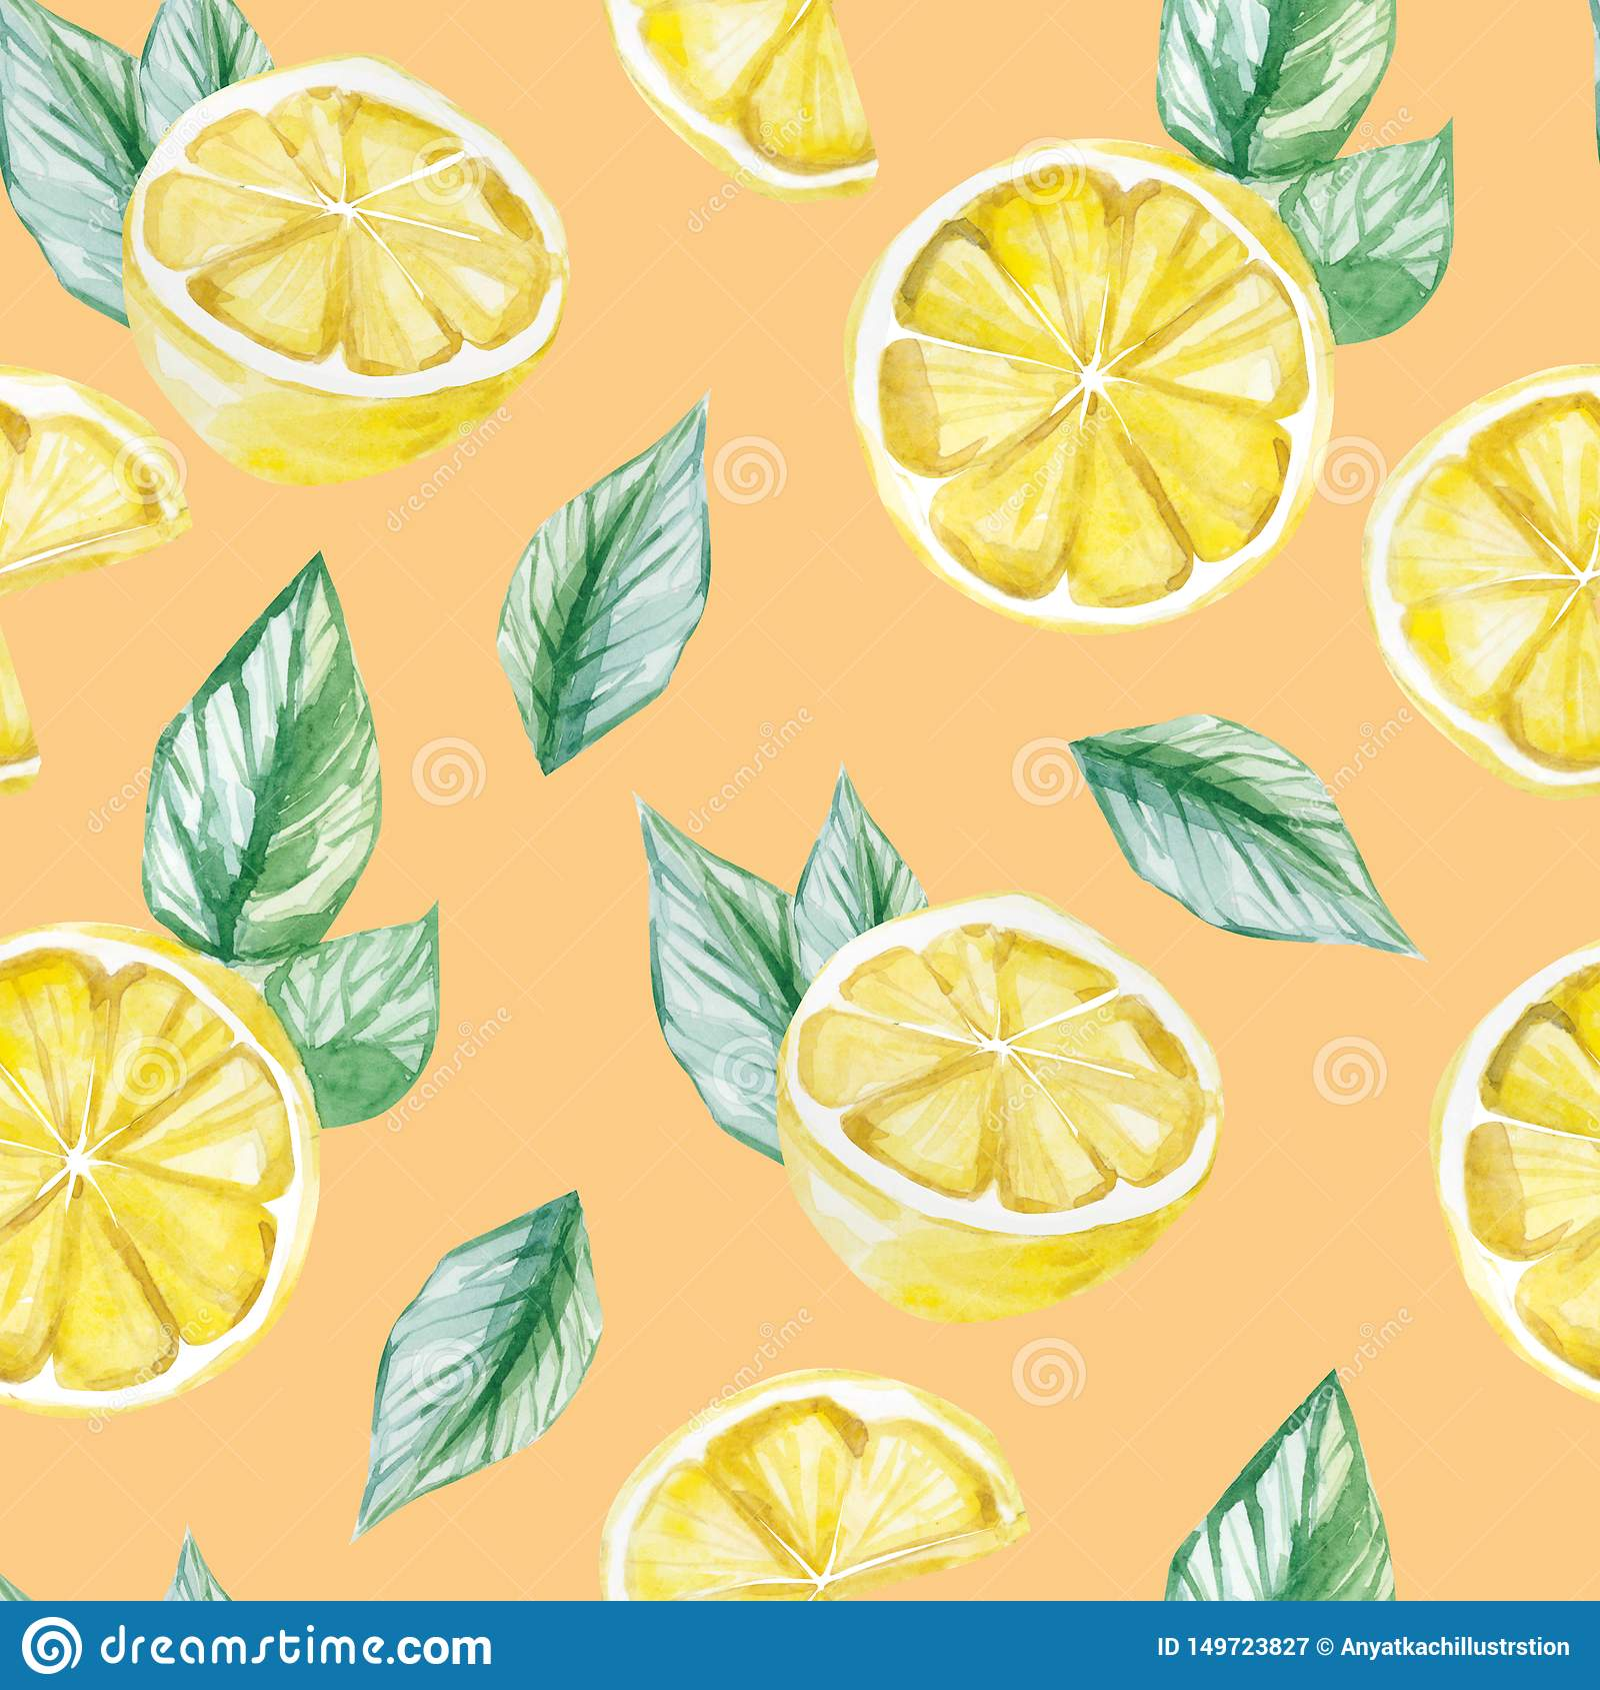 Watercolor Fruit Pattern Lemon Summer Print For The Textile